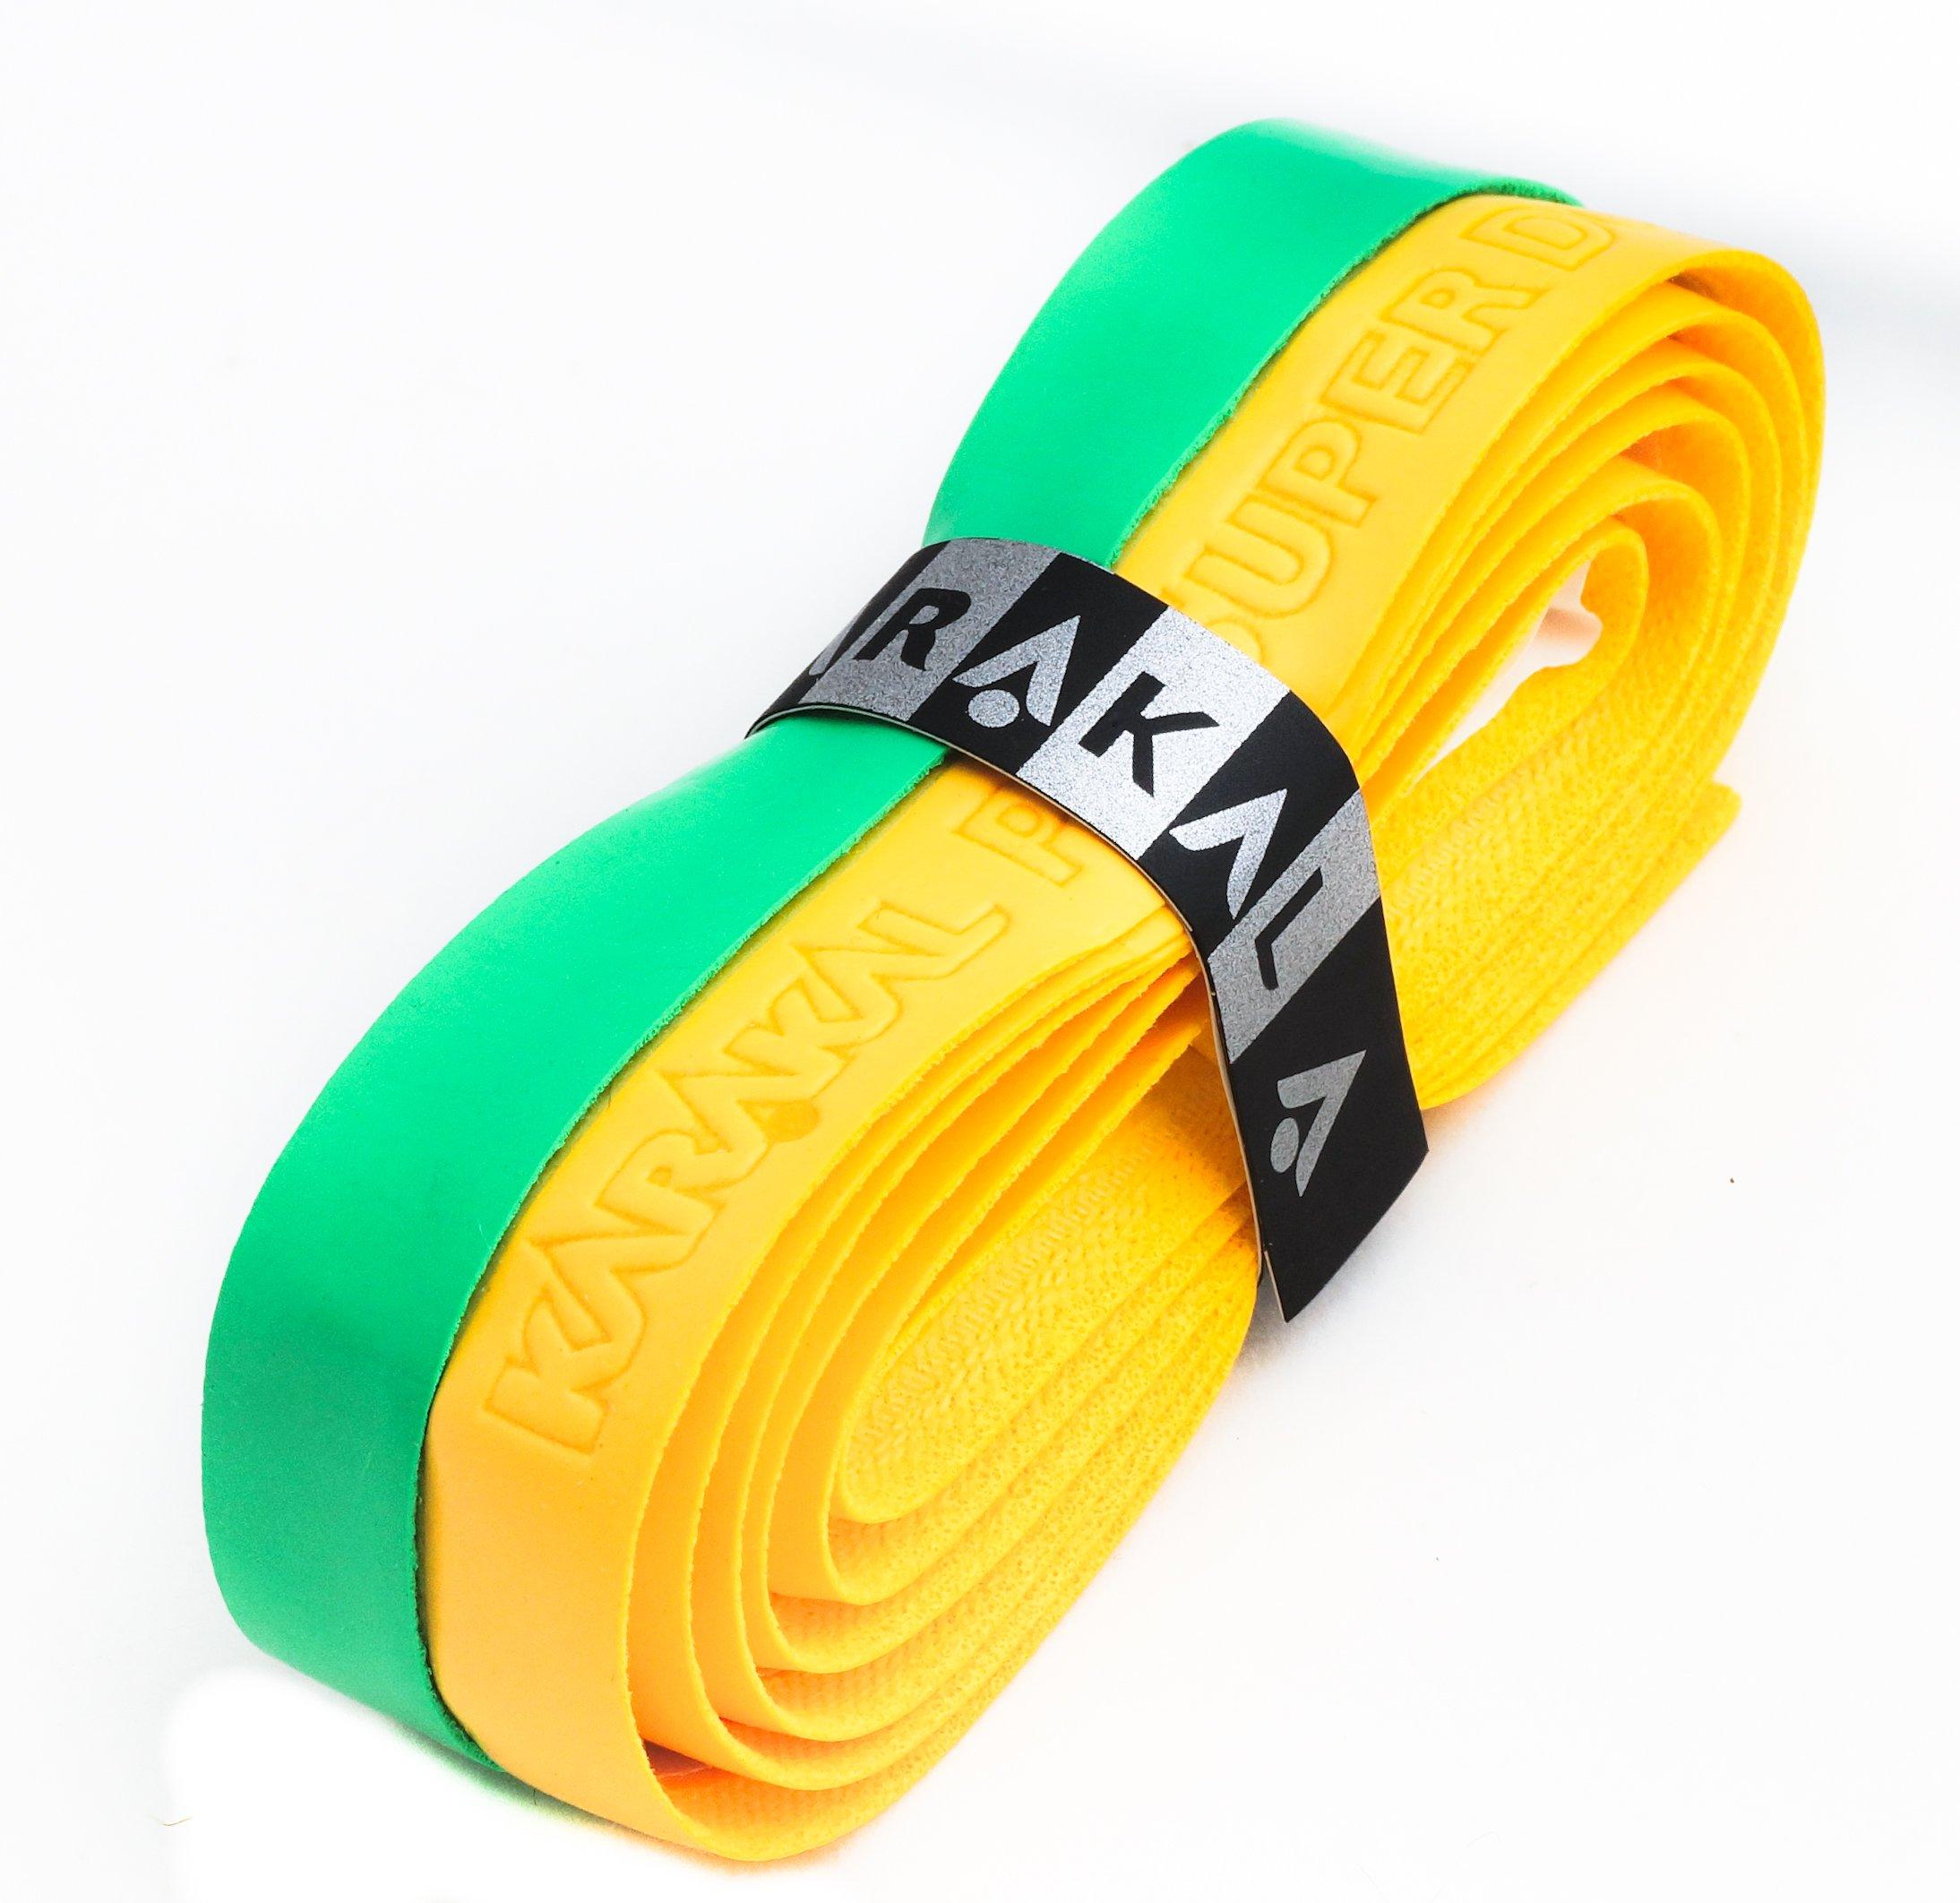 Karakal PU Supergrip replacement racquet grip - tennis / badminton / squash - Yellow / Green x 6 by Karakal